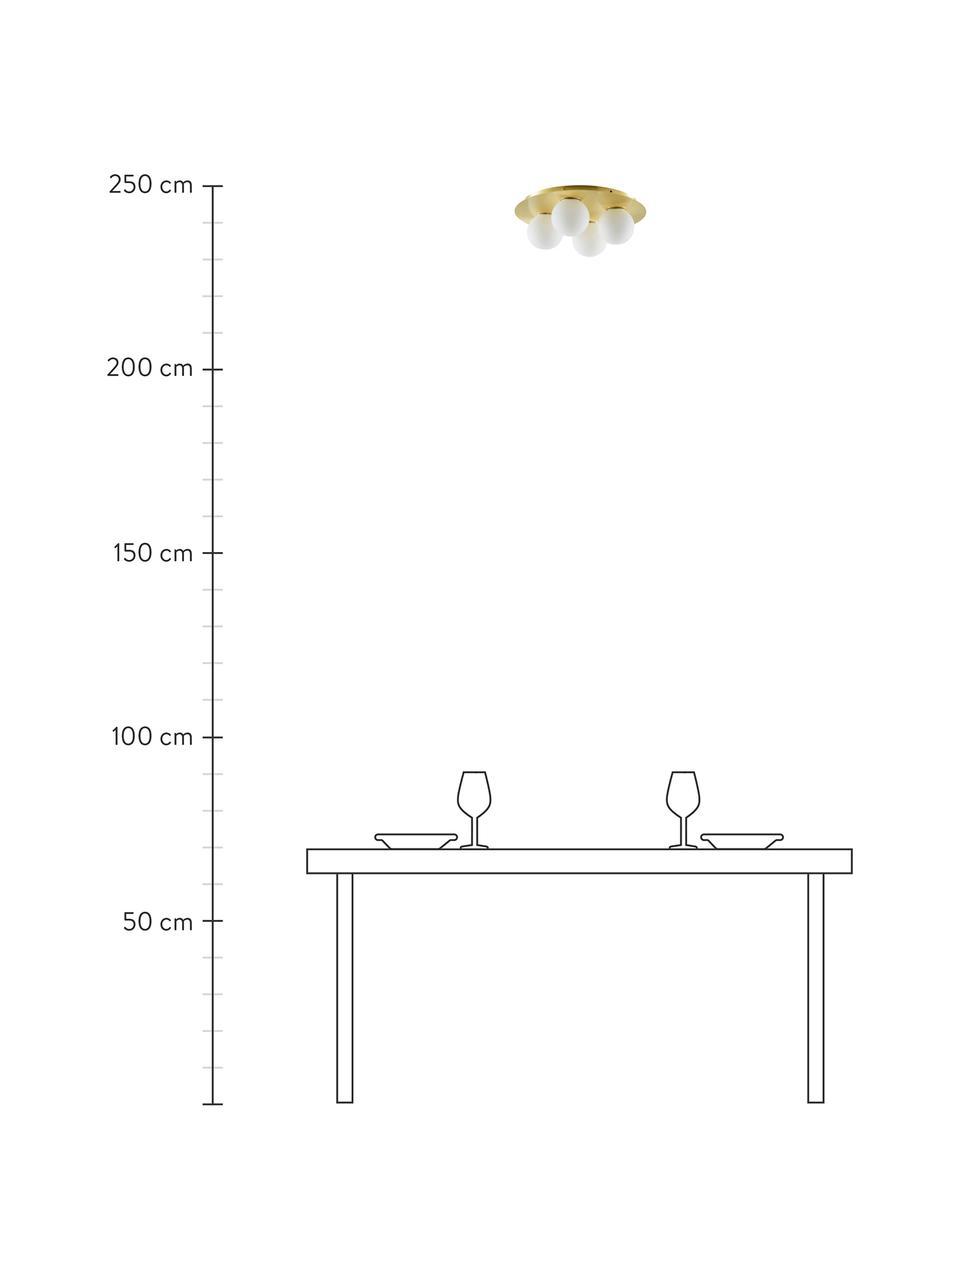 Deckenleuchte Hitch aus Opalglas, Baldachin: Metall, vermessingt, Baldachin und Fassung: Messing, mattLampenschirme: Weiß, Ø 36 x H 12 cm